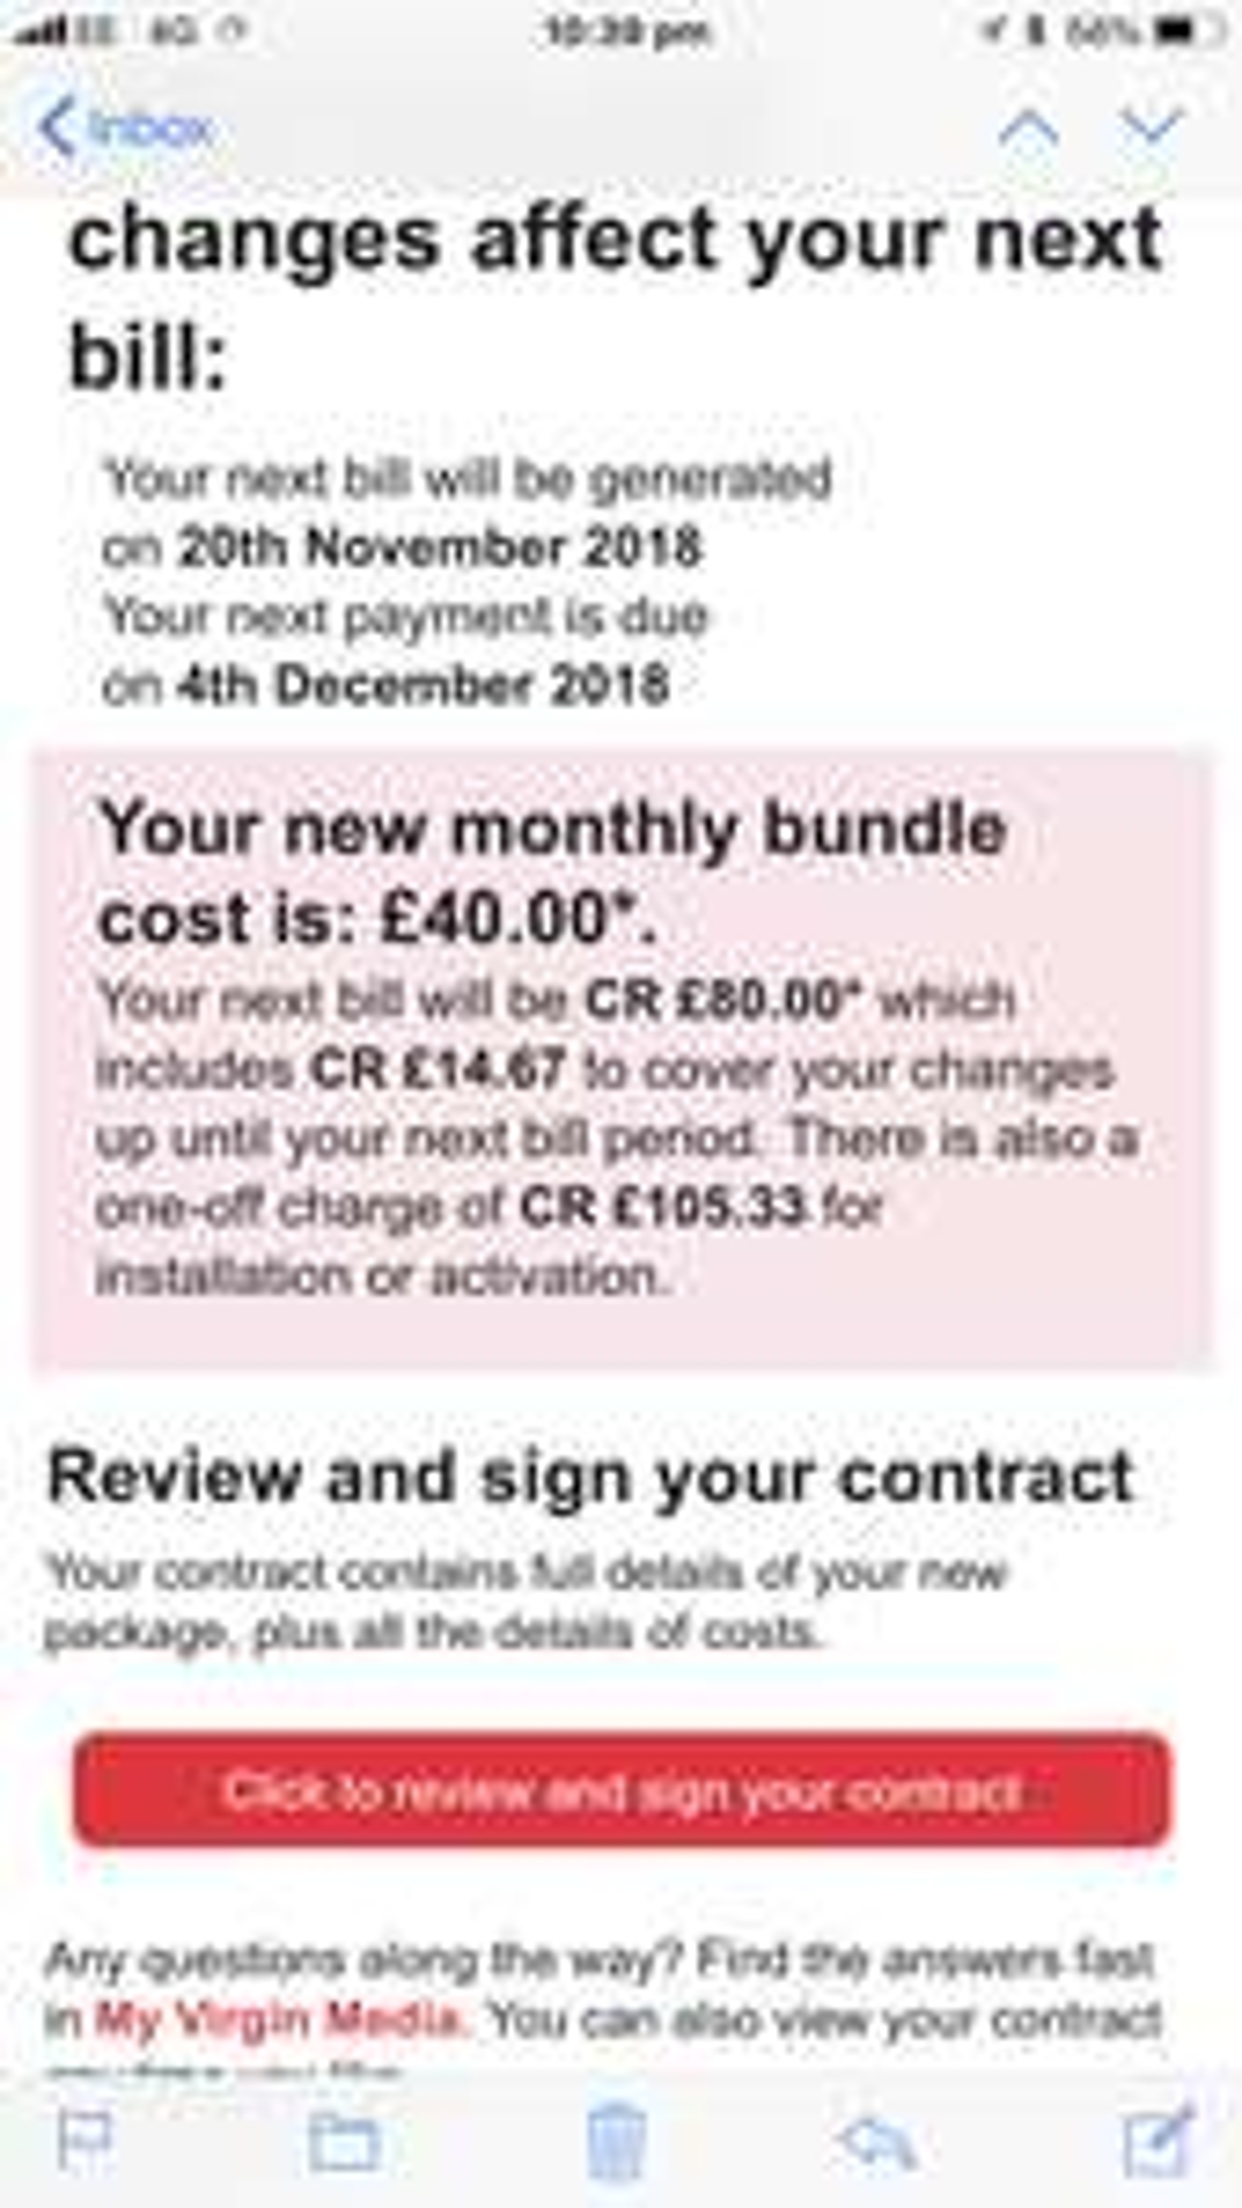 Virgin Media Retention - 350mb Fibre and anytime calls £40 p/m + £120 bill credit - total £360